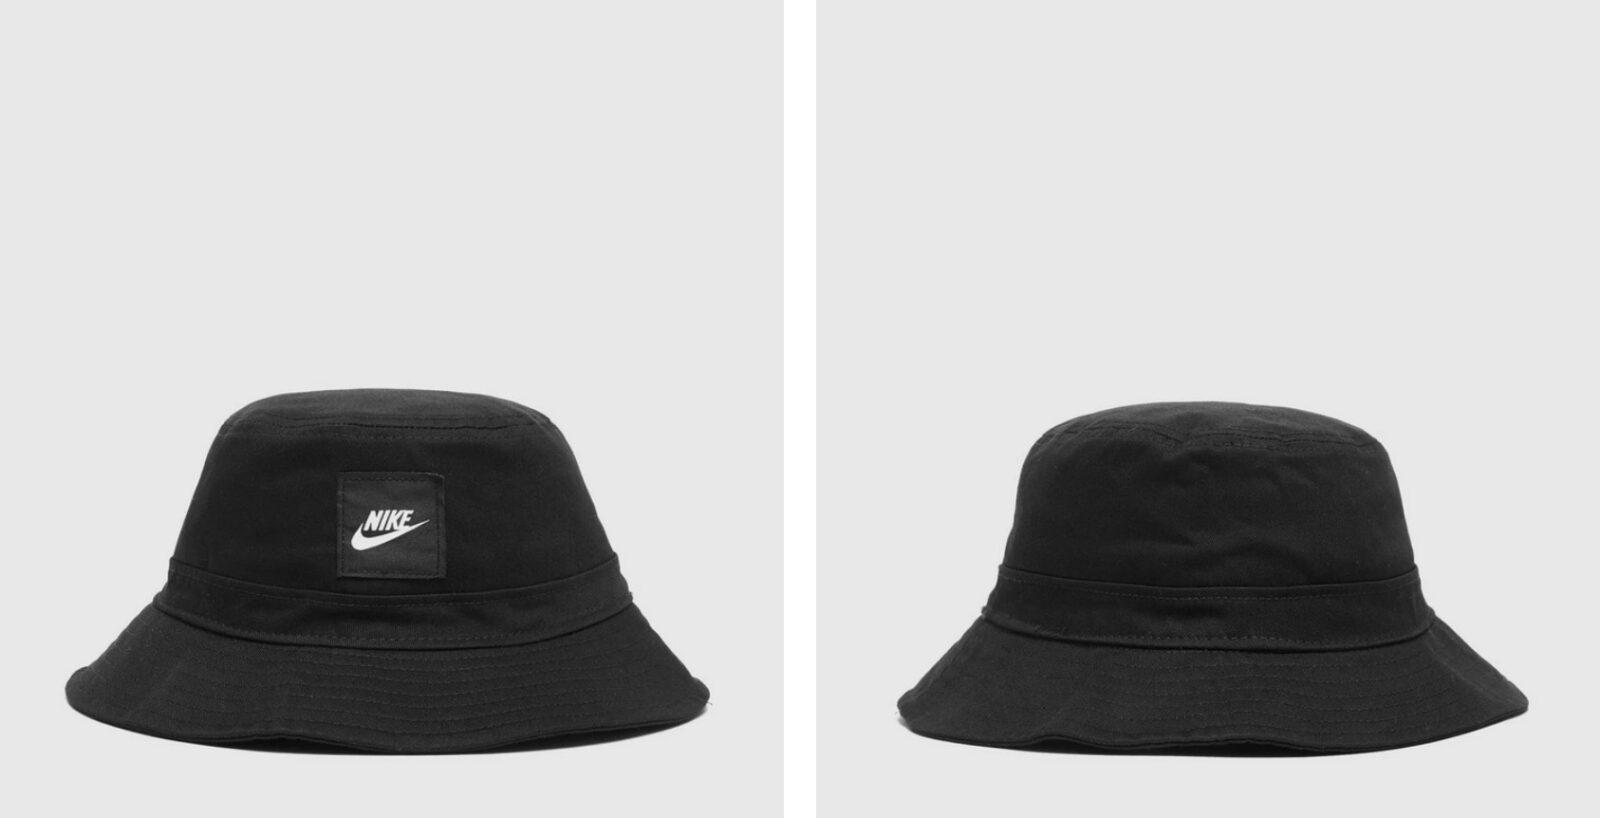 Nike Bucket Hat Black